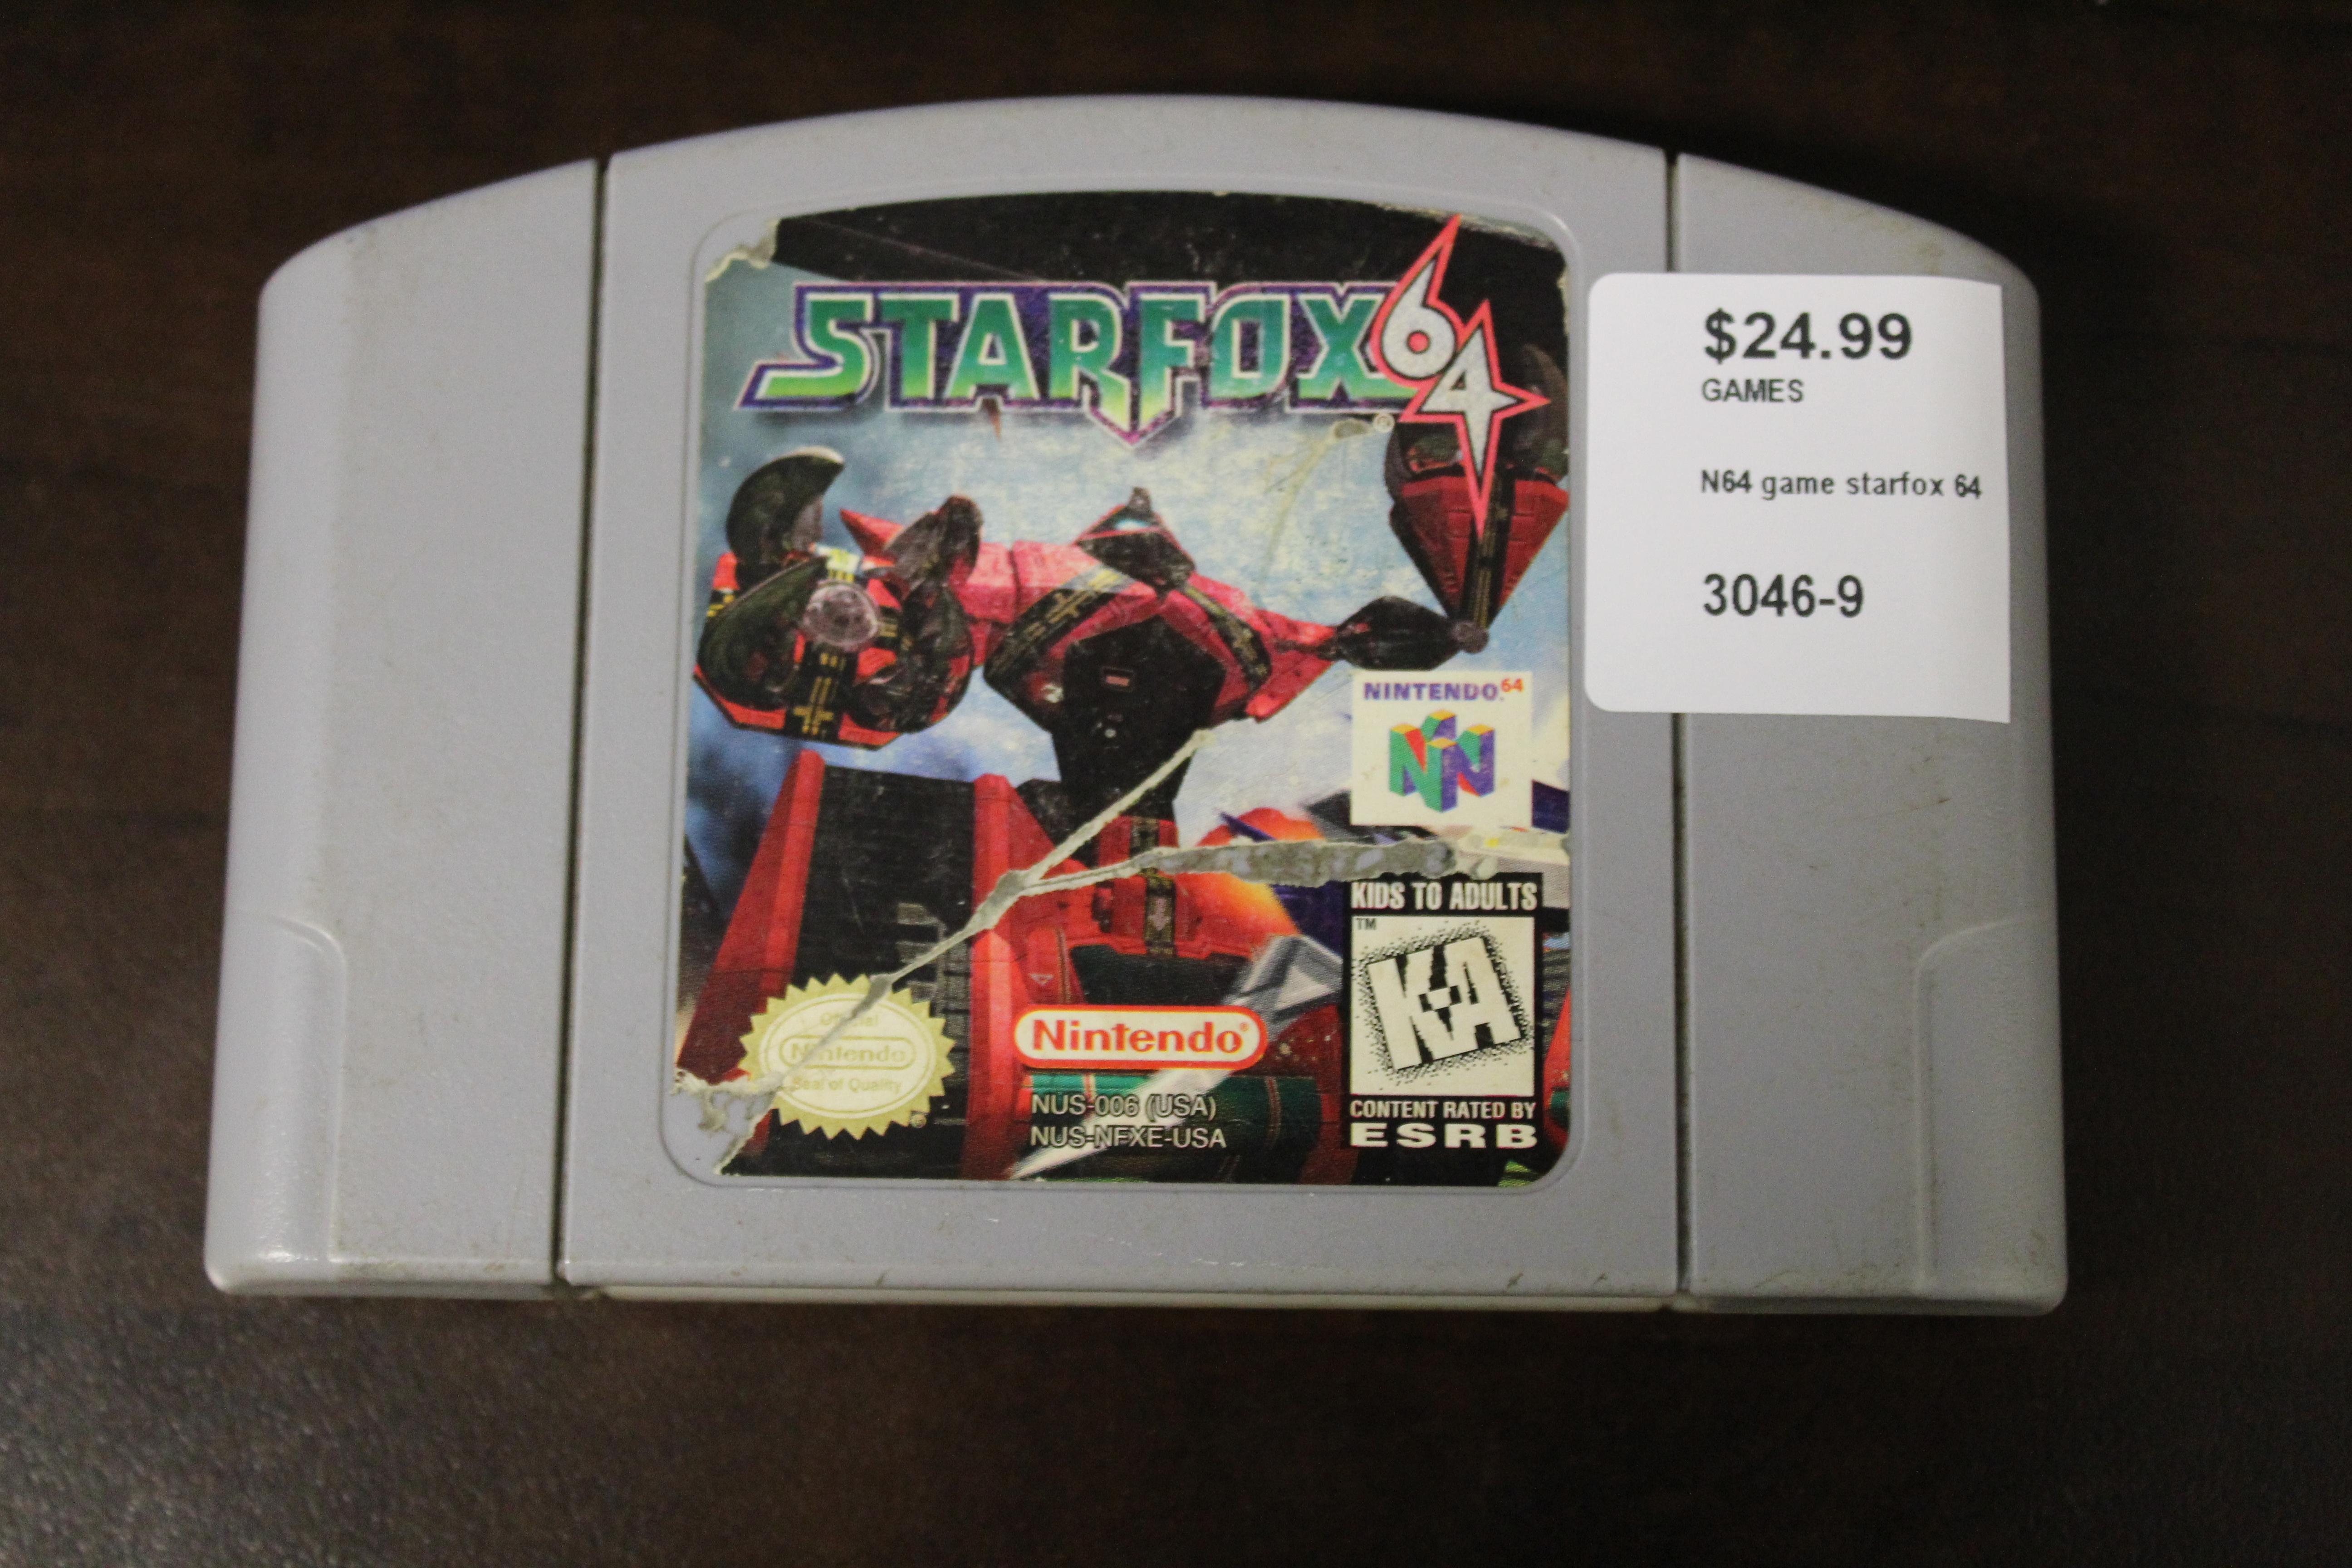 N64 Game Starfox 64